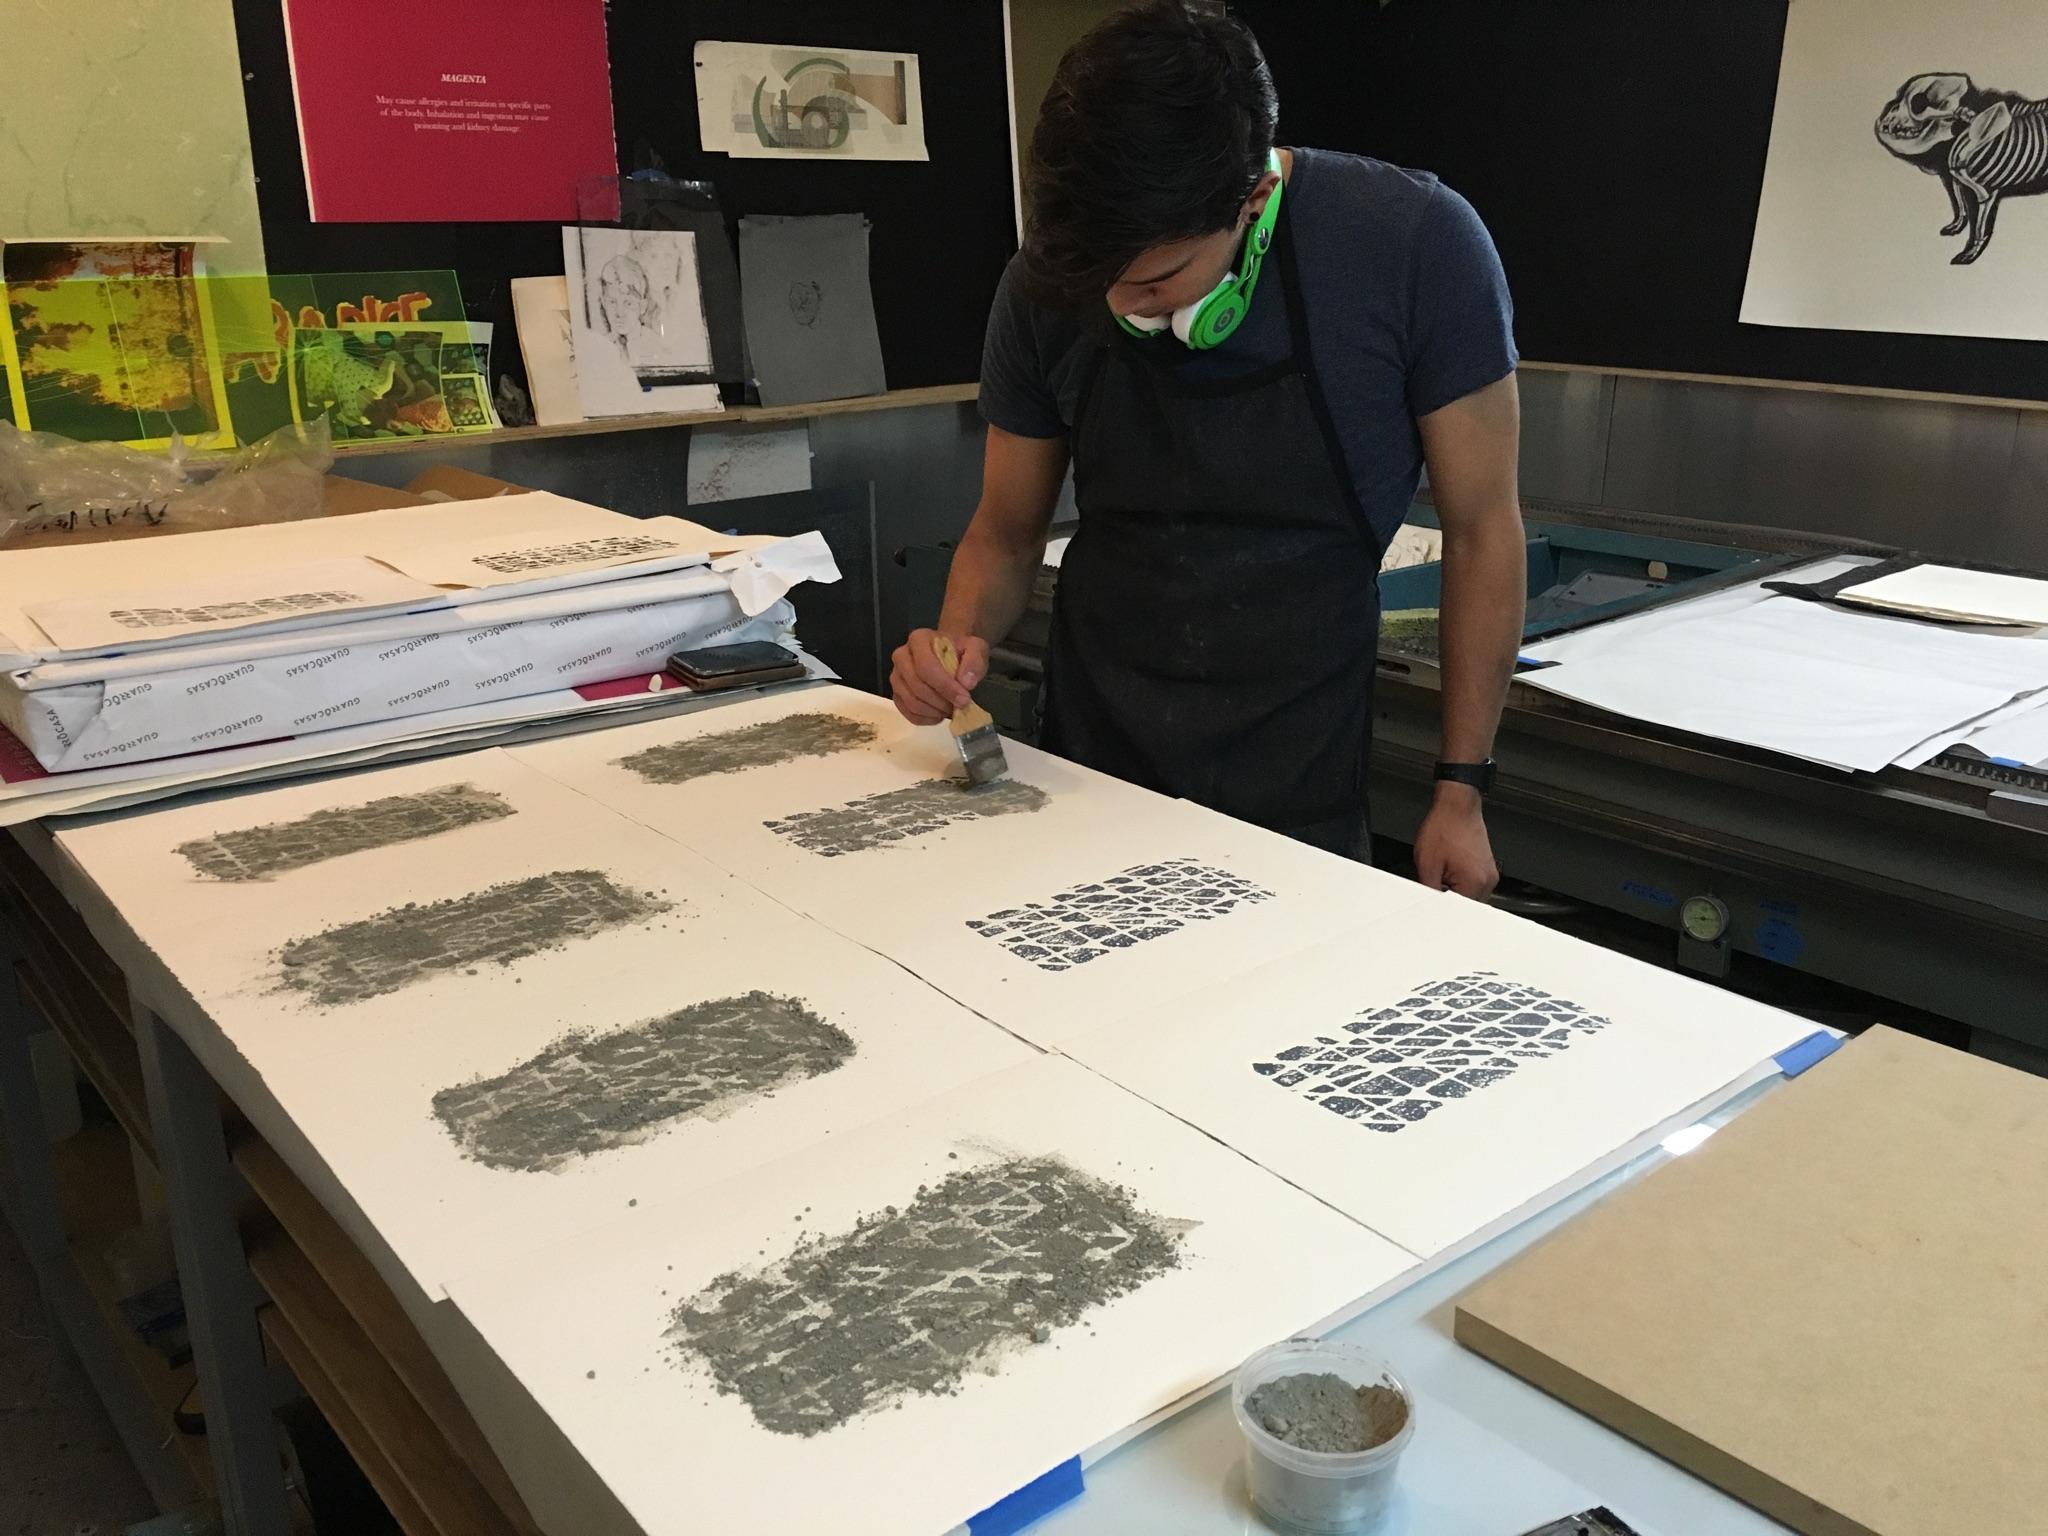 Rodolfo Díaz Cervantes Relieve, tinta y cemento en polvo sobre papel